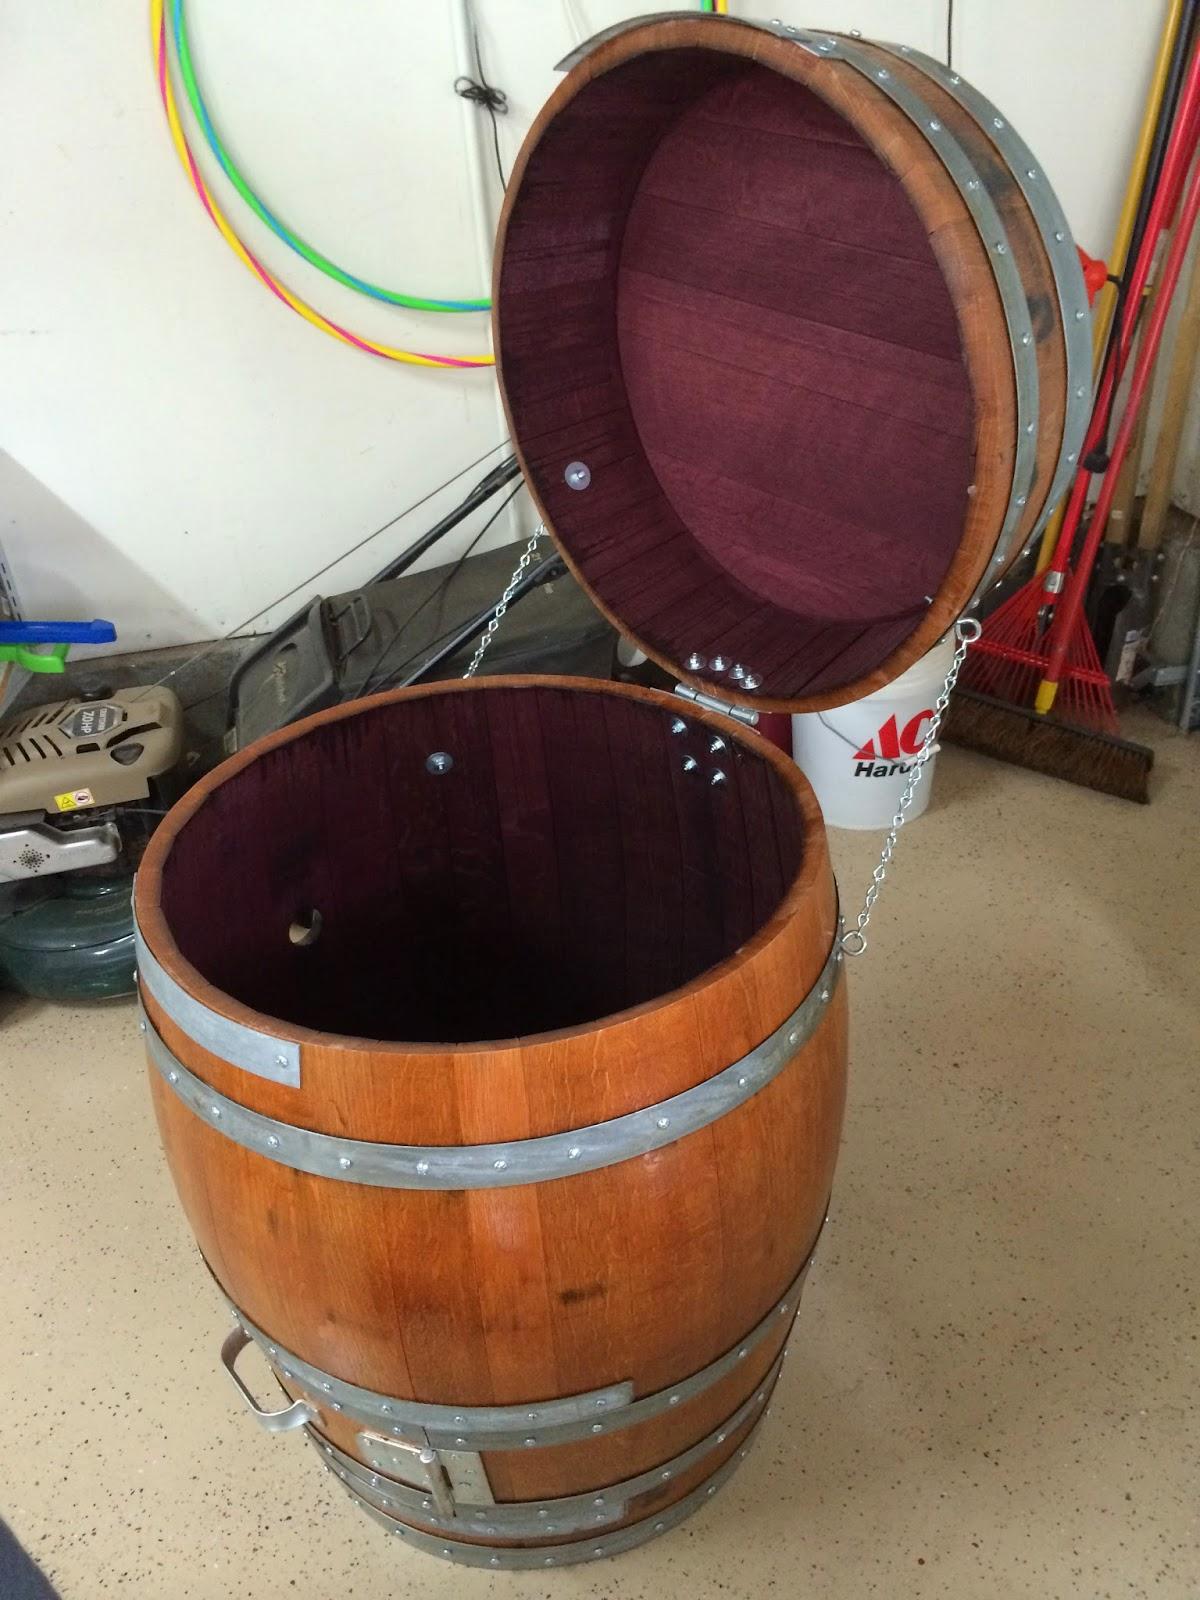 My Wine Barrel Smoker: My Wine Barrel Smoker Build